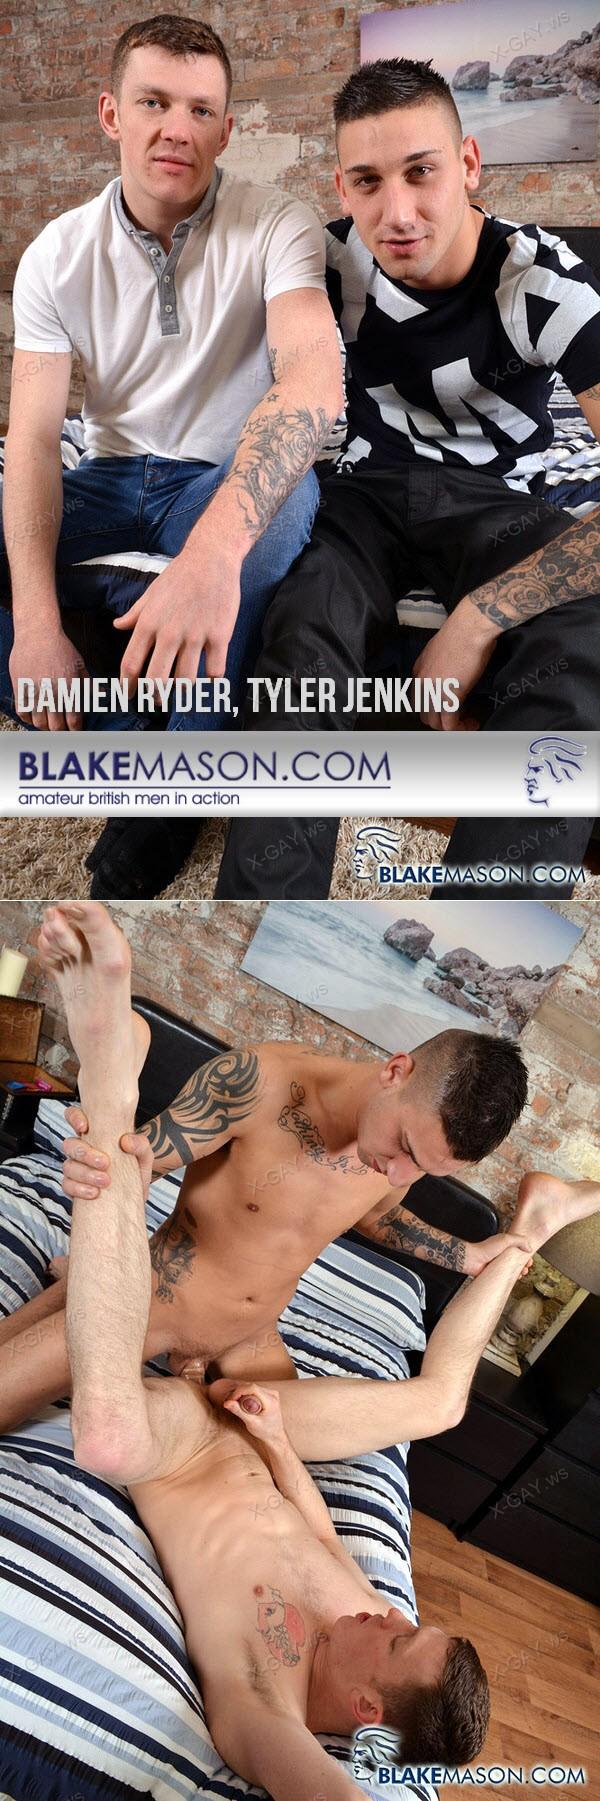 BlakeMason: Bi Guy Tyler Slams That Arse (Damien Ryder, Tyler Jenkins)